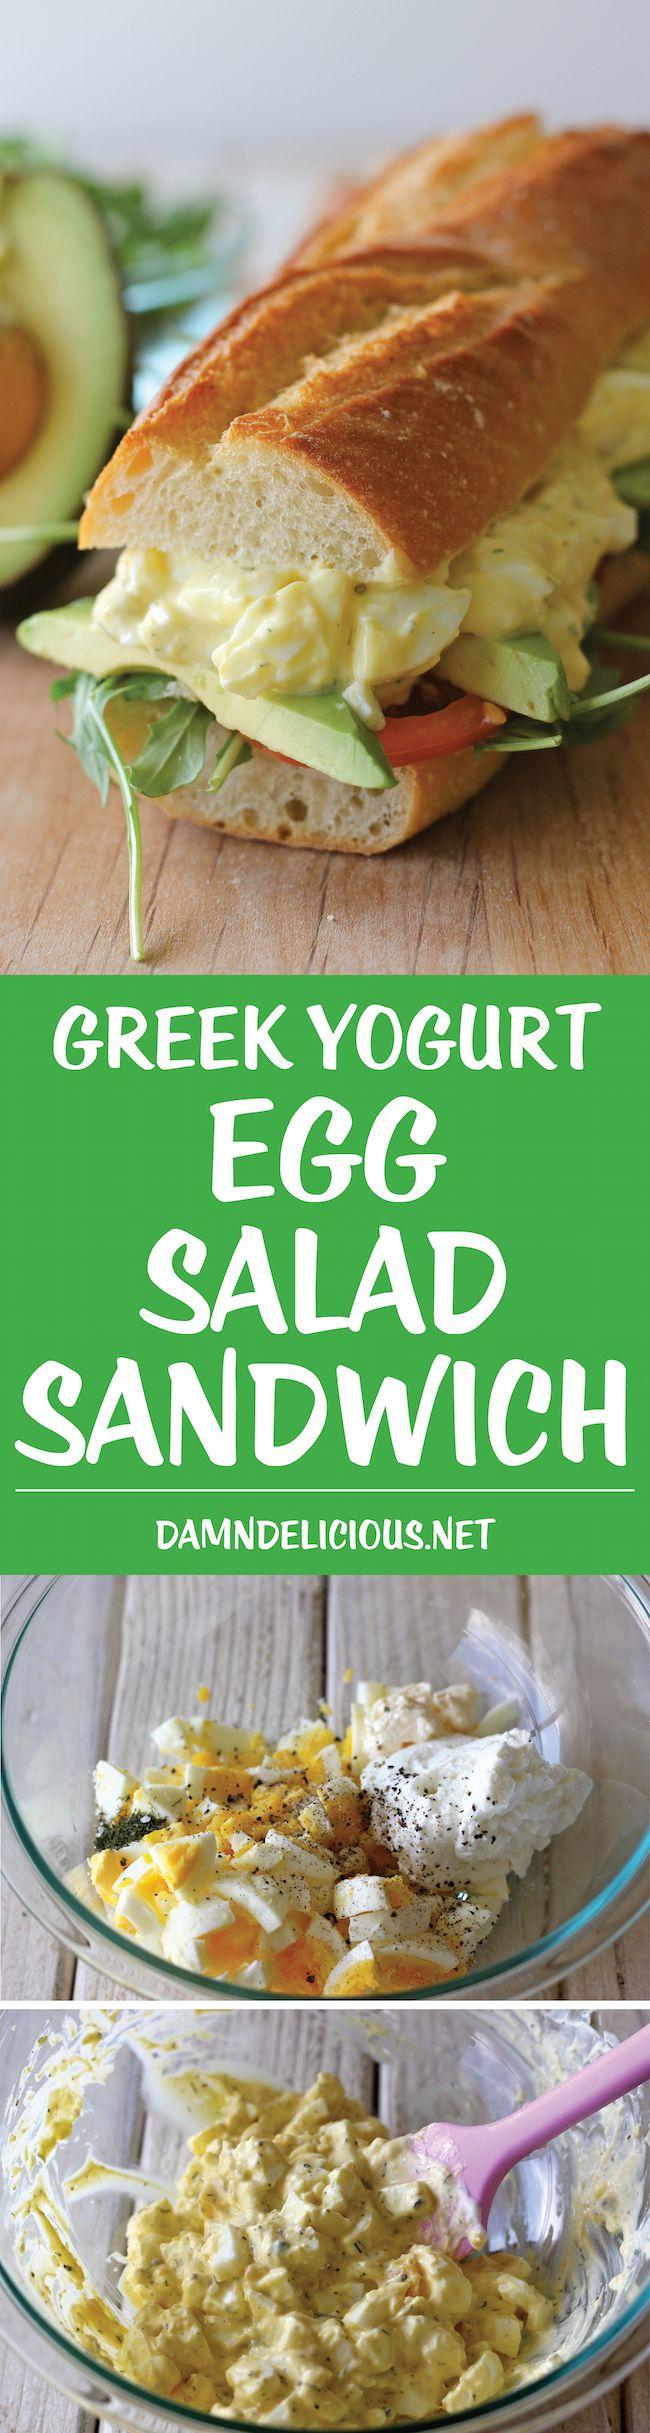 Greek Yogurt Egg Salad Sandwich - Lightened up with Greek yogurt, you'll have a hearty sandwich in minutes. And it doesn't taste healthy!